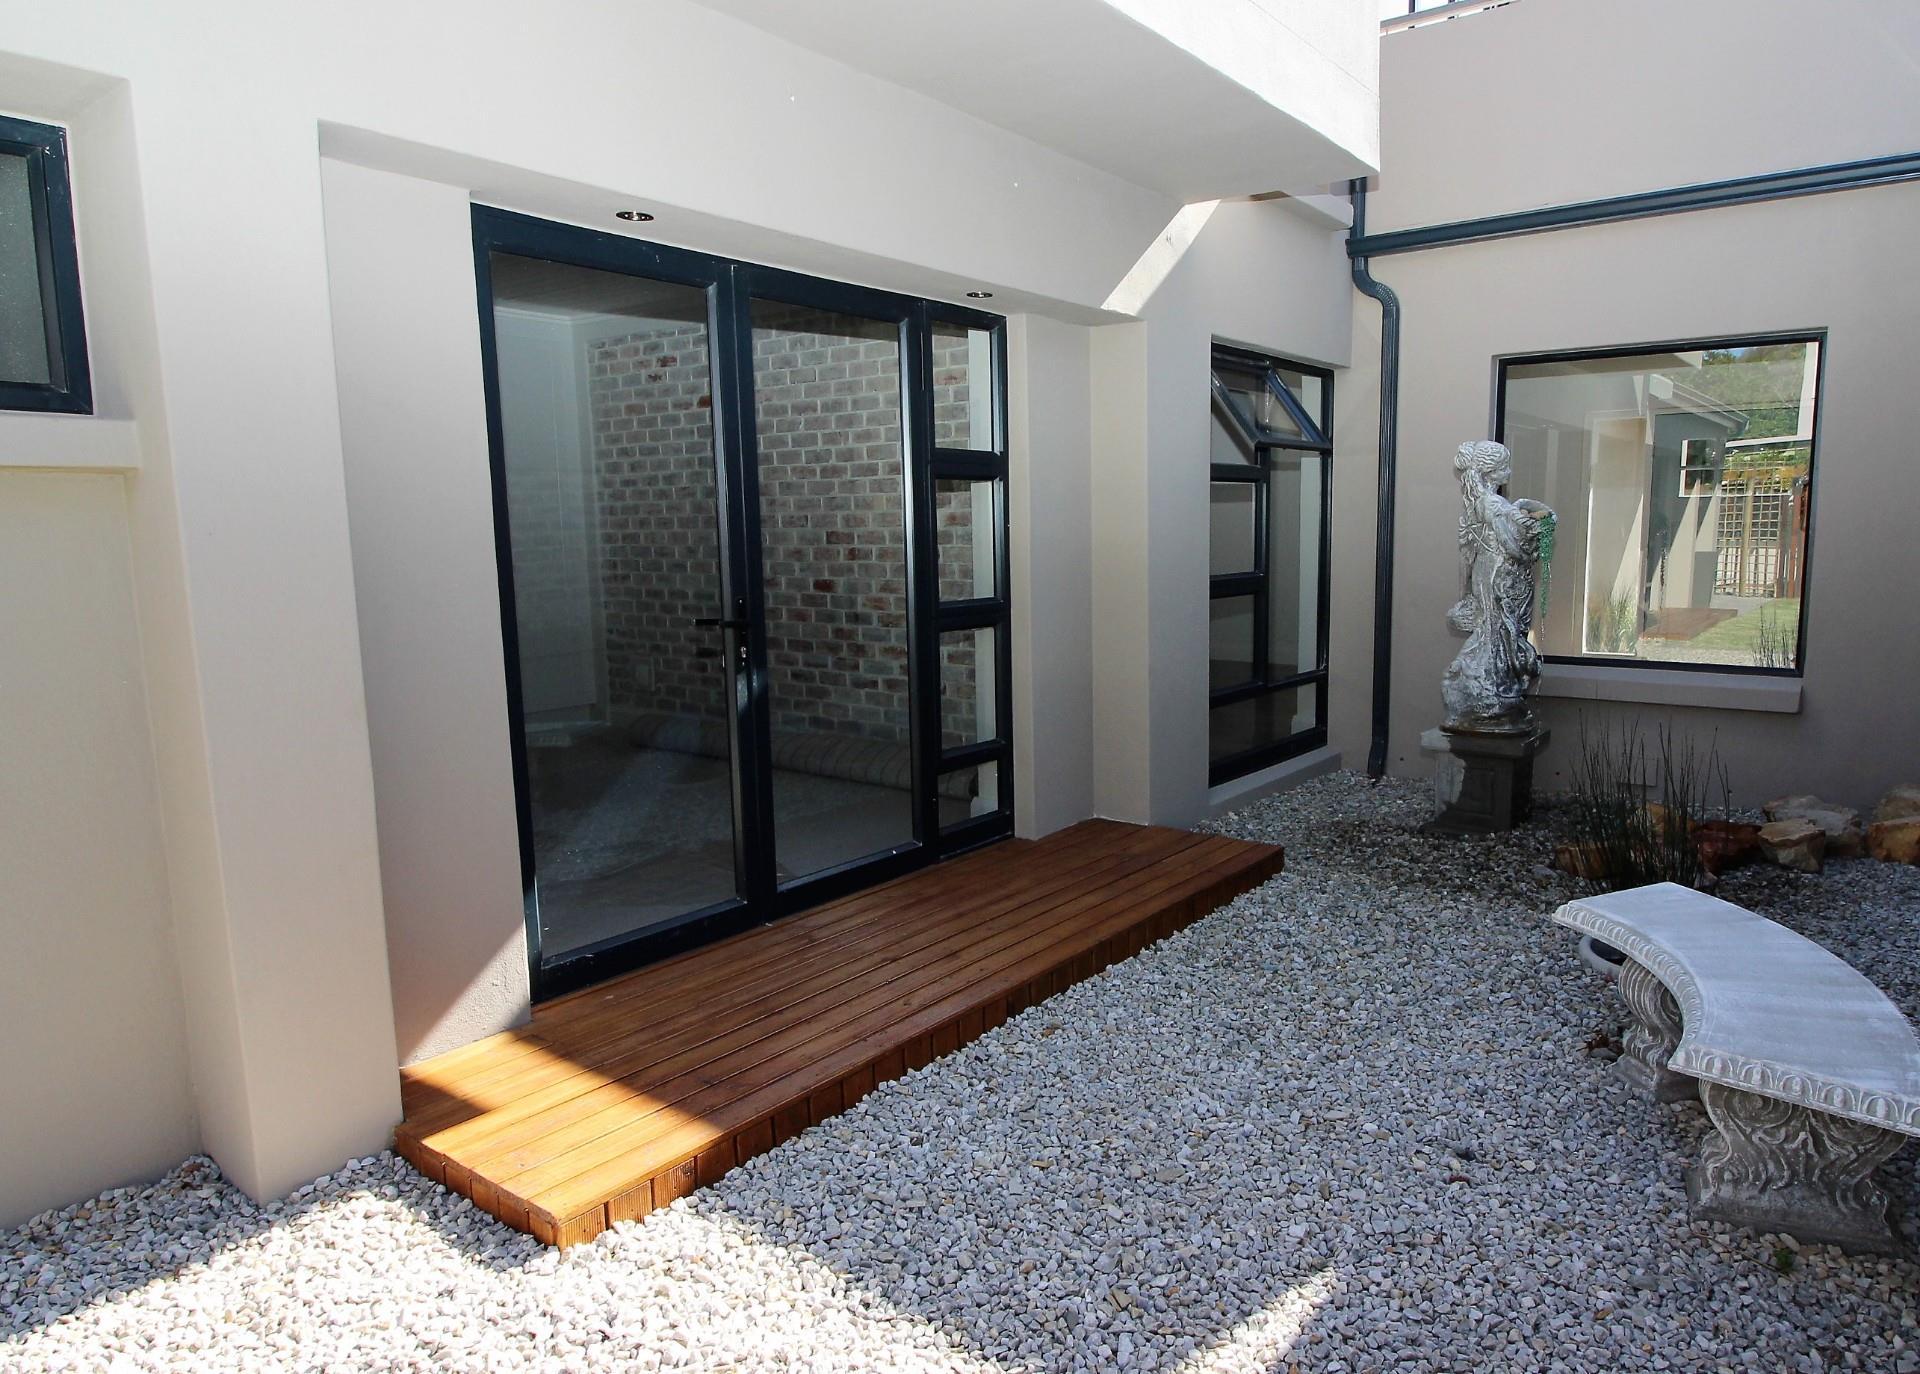 4 Bedroom House For Sale in Phantom Village